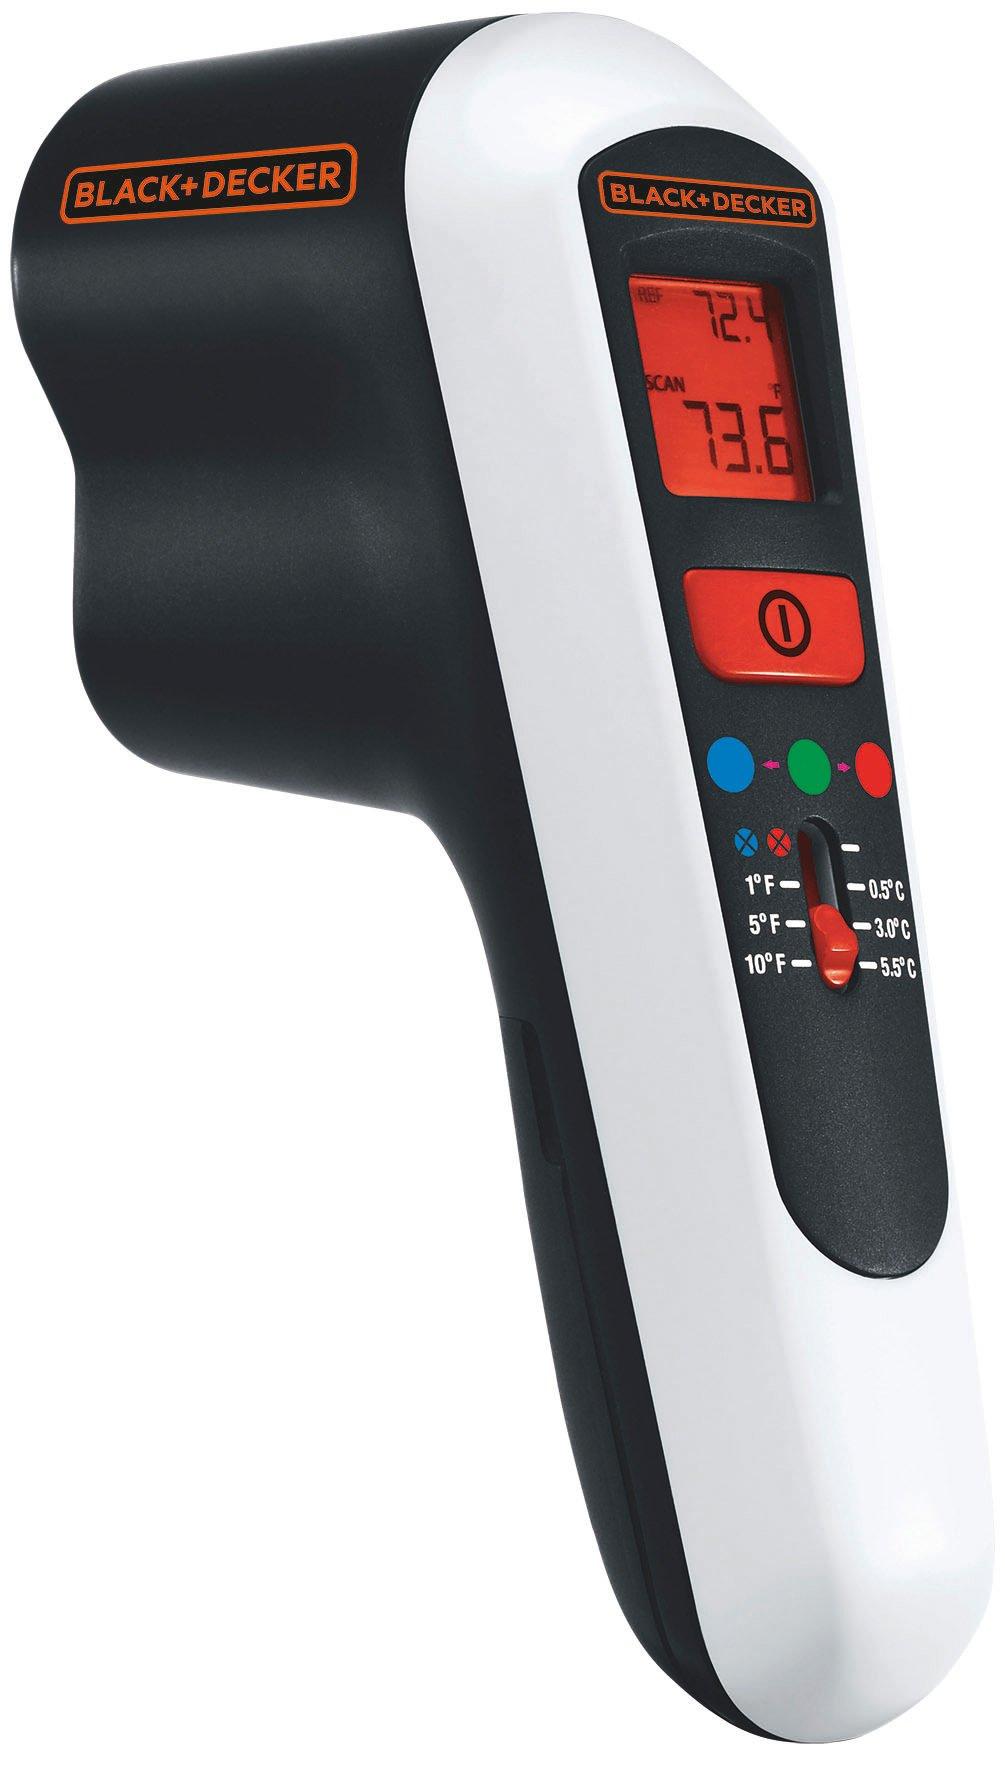 BLACK DECKER TLD100 Thermal Detector